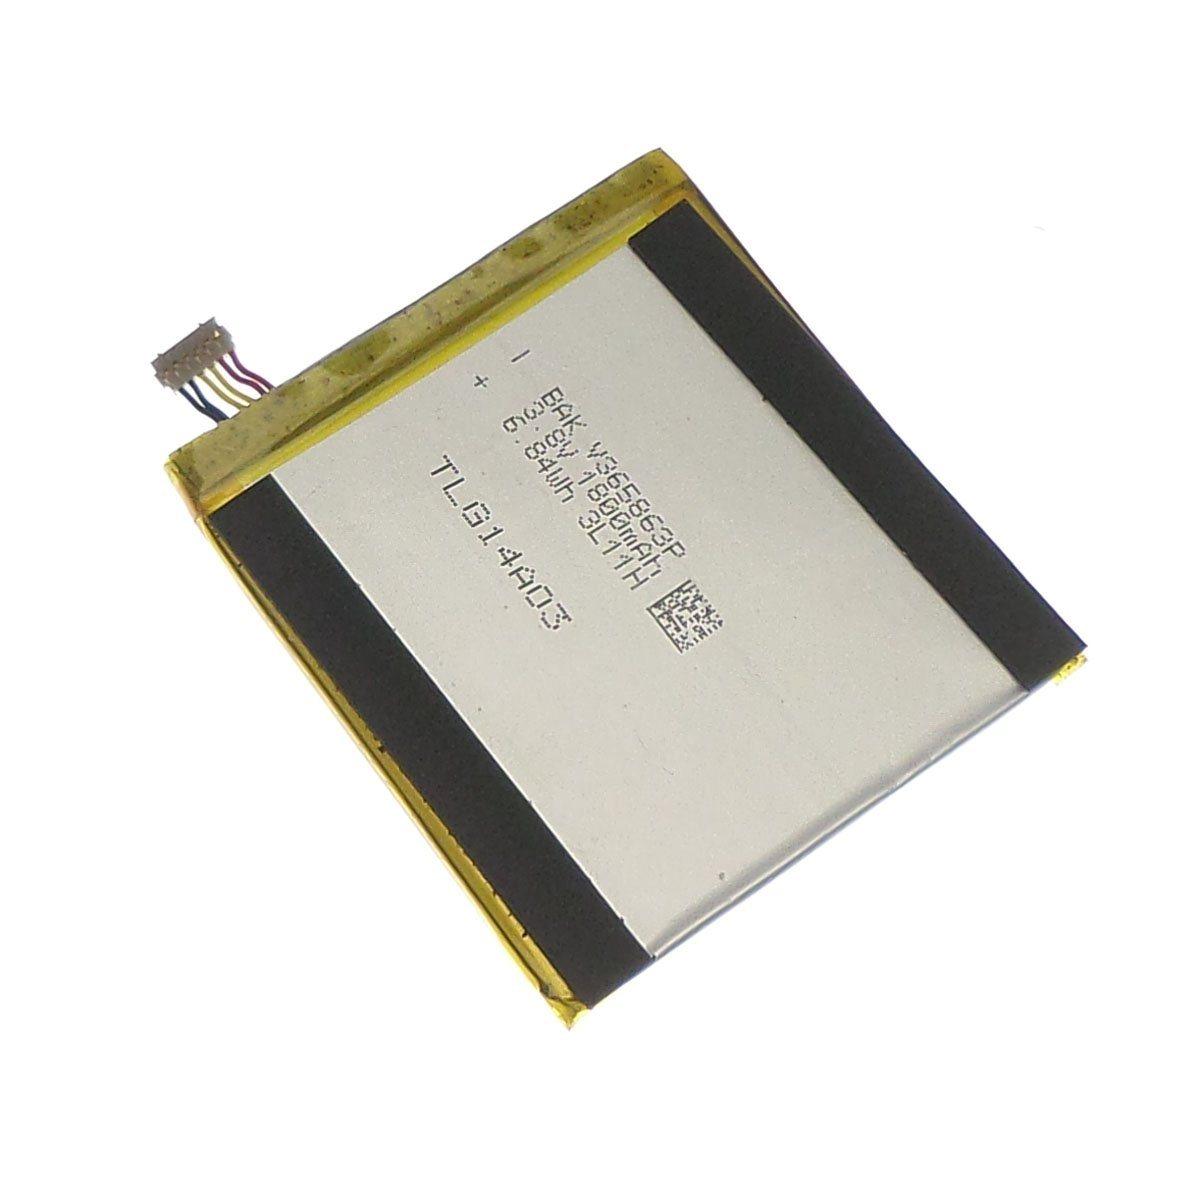 Batterie compatible Wiko Darkmoon TLE14A15 /13